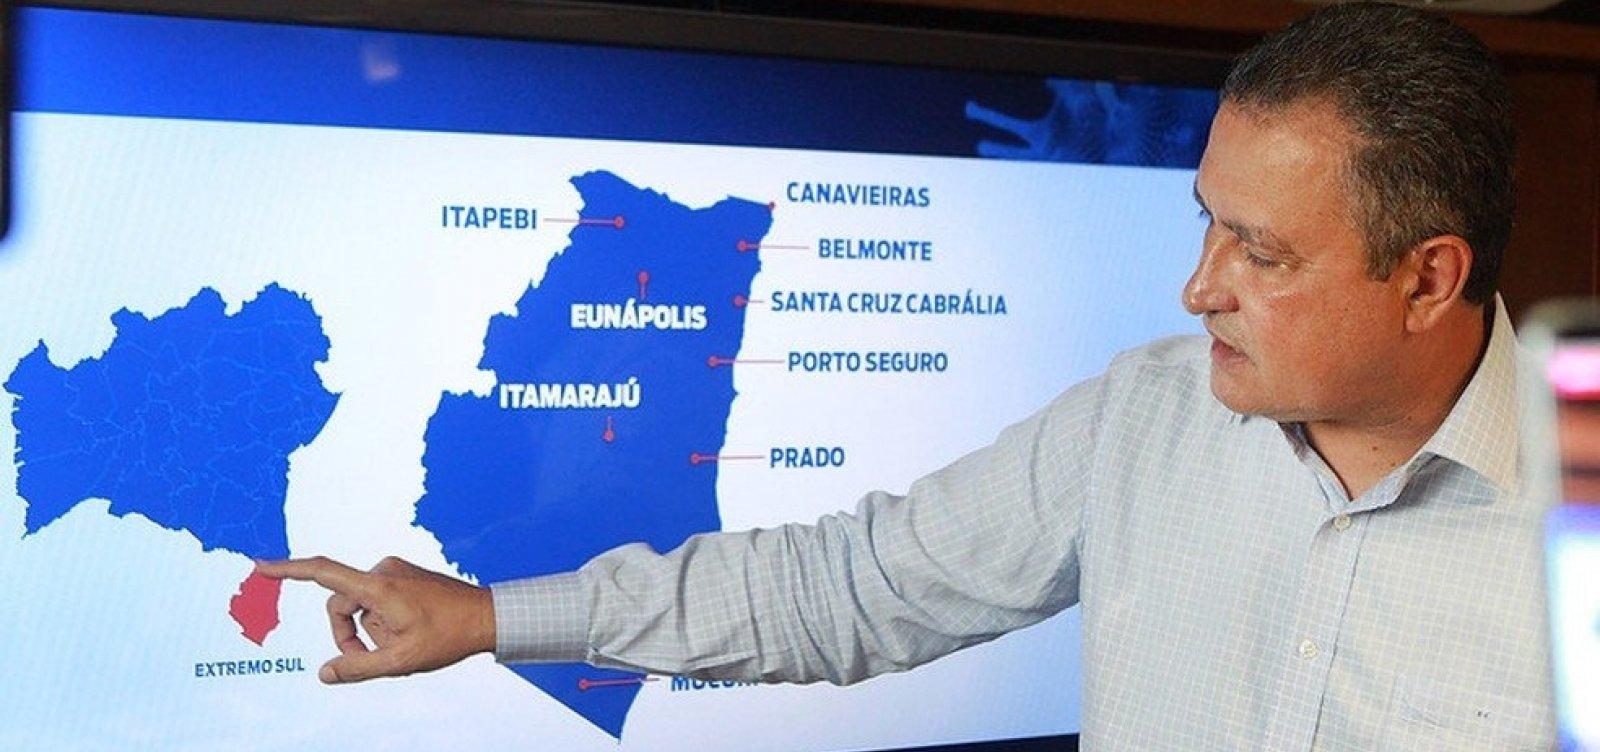 [Rui prorroga medidas restritivas a 19 municípios no extremo-sul da Bahia]